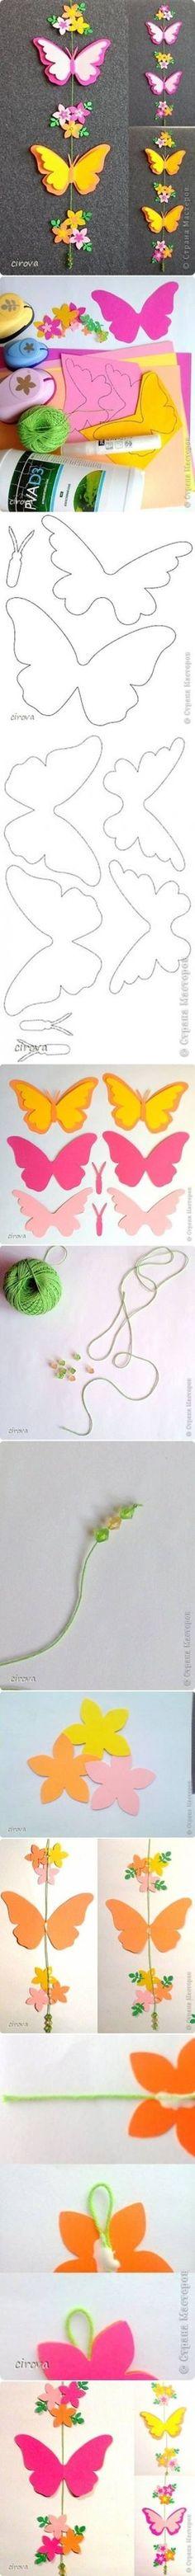 DIY Paper Butterfly Mobile by EstTera